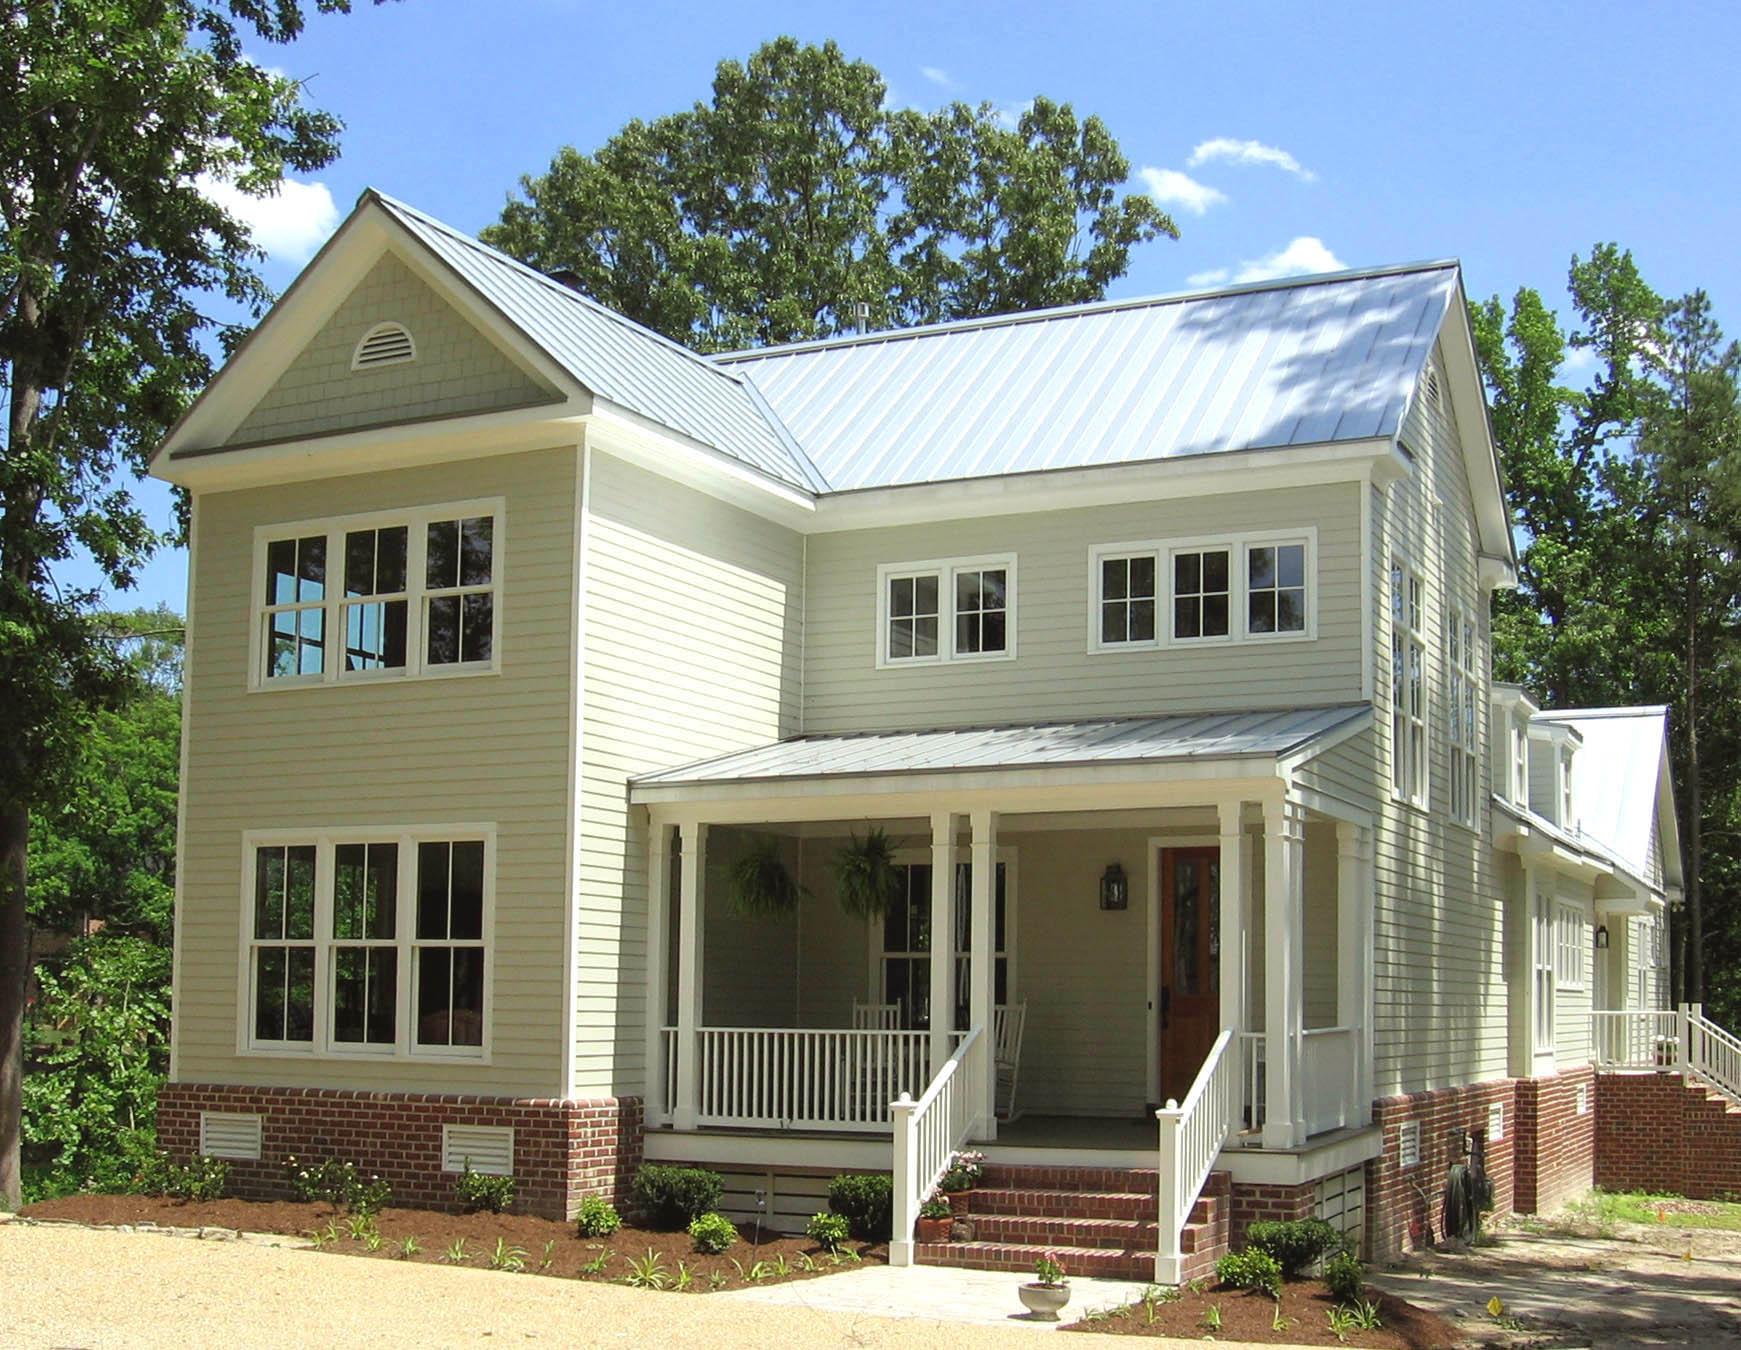 Attractive farmhouse with garage bonus 30013rt for Farmhouse plans